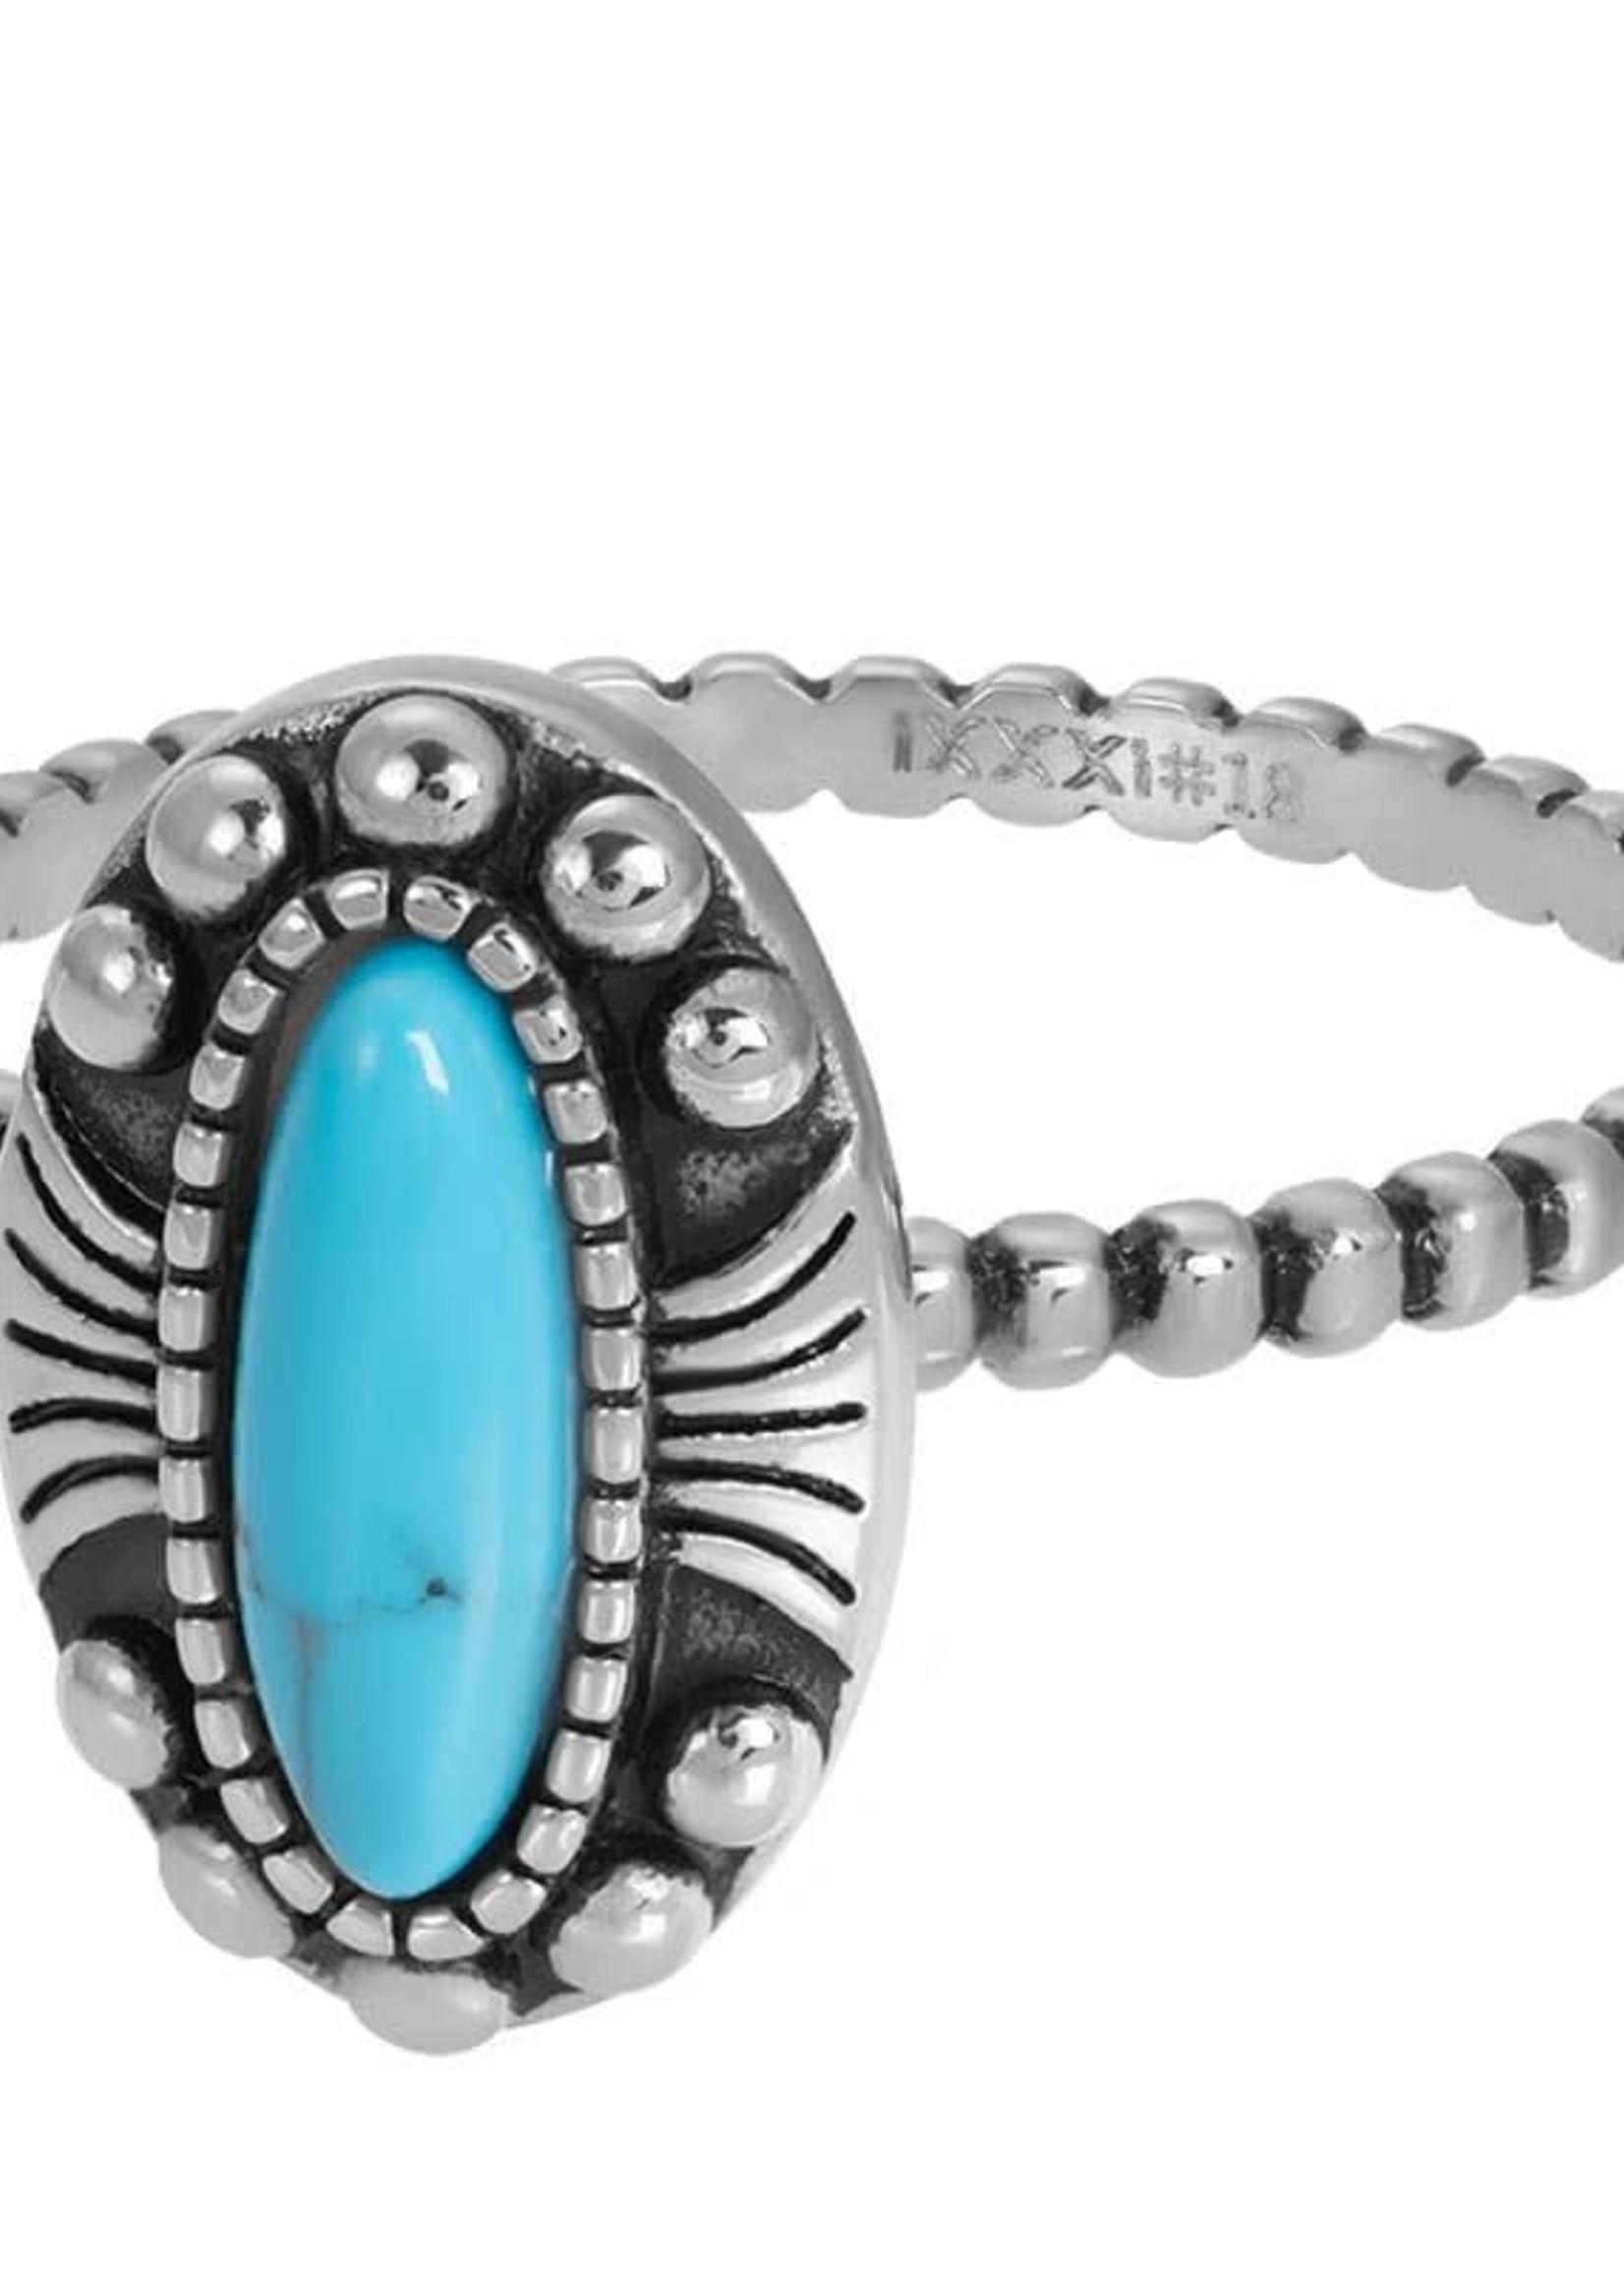 iXXXi Jewelry iXXXi vulring indian turquoise